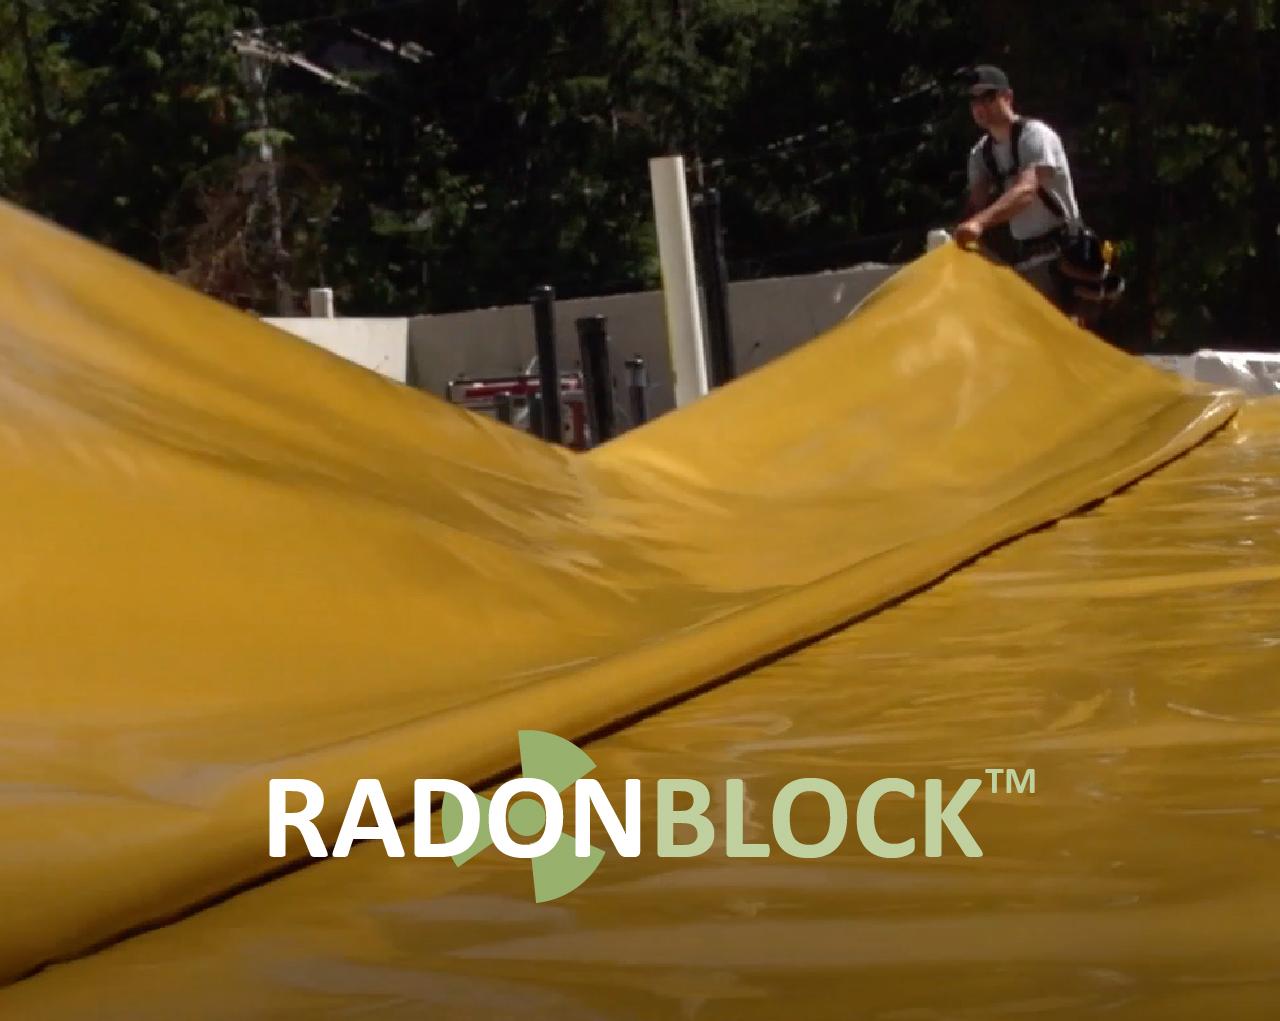 RadonBlock08logo-01.jpg